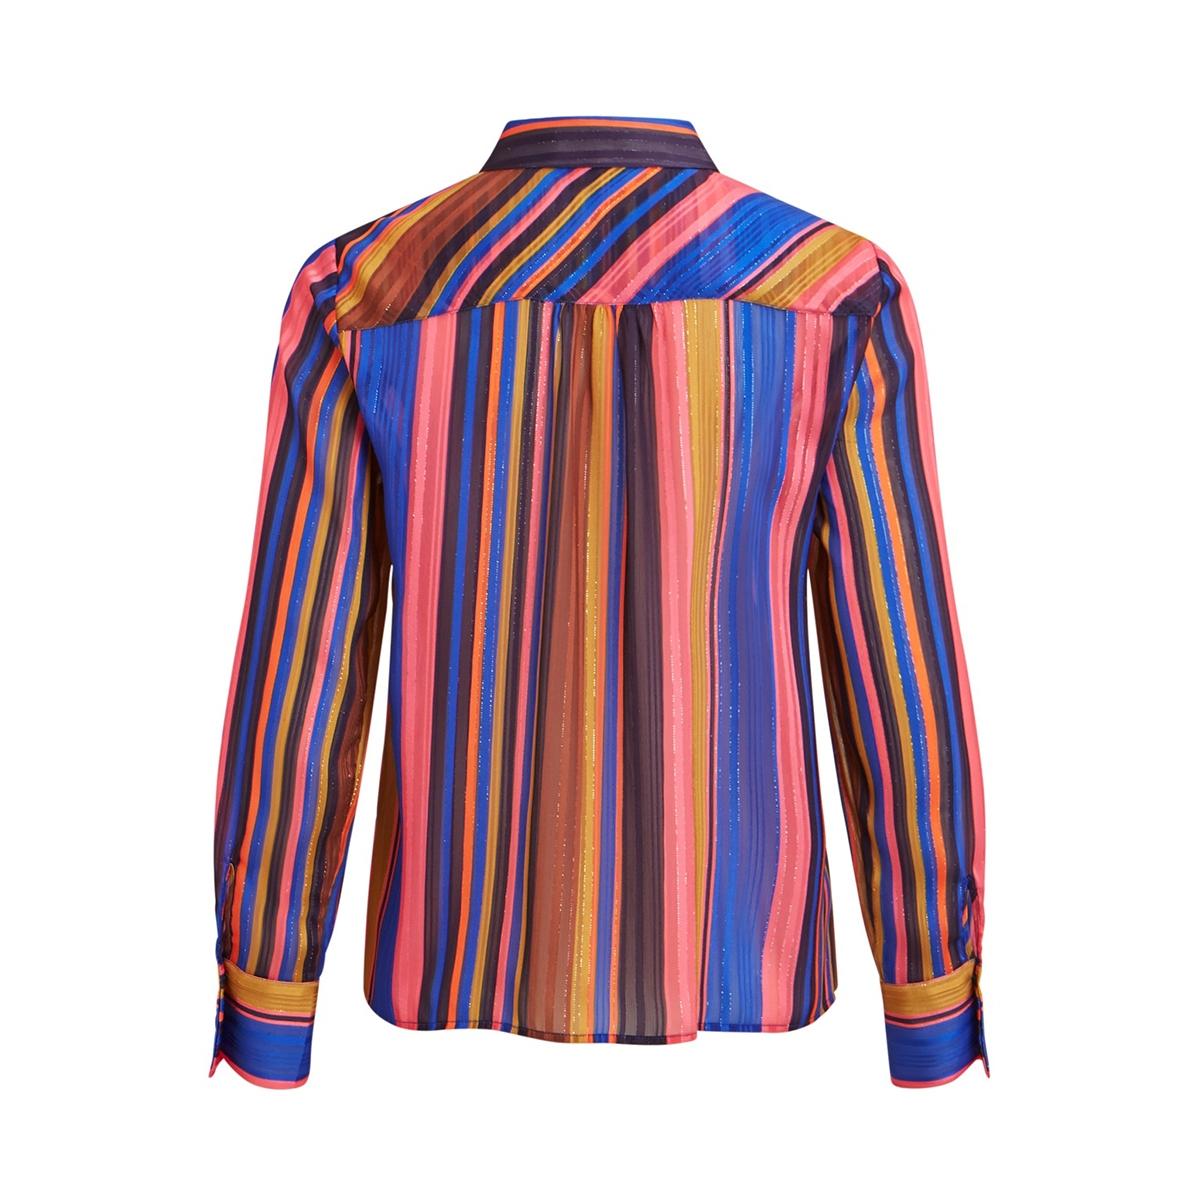 objhilma ls shirt 106 23030823 object blouse honeysuckle/aop